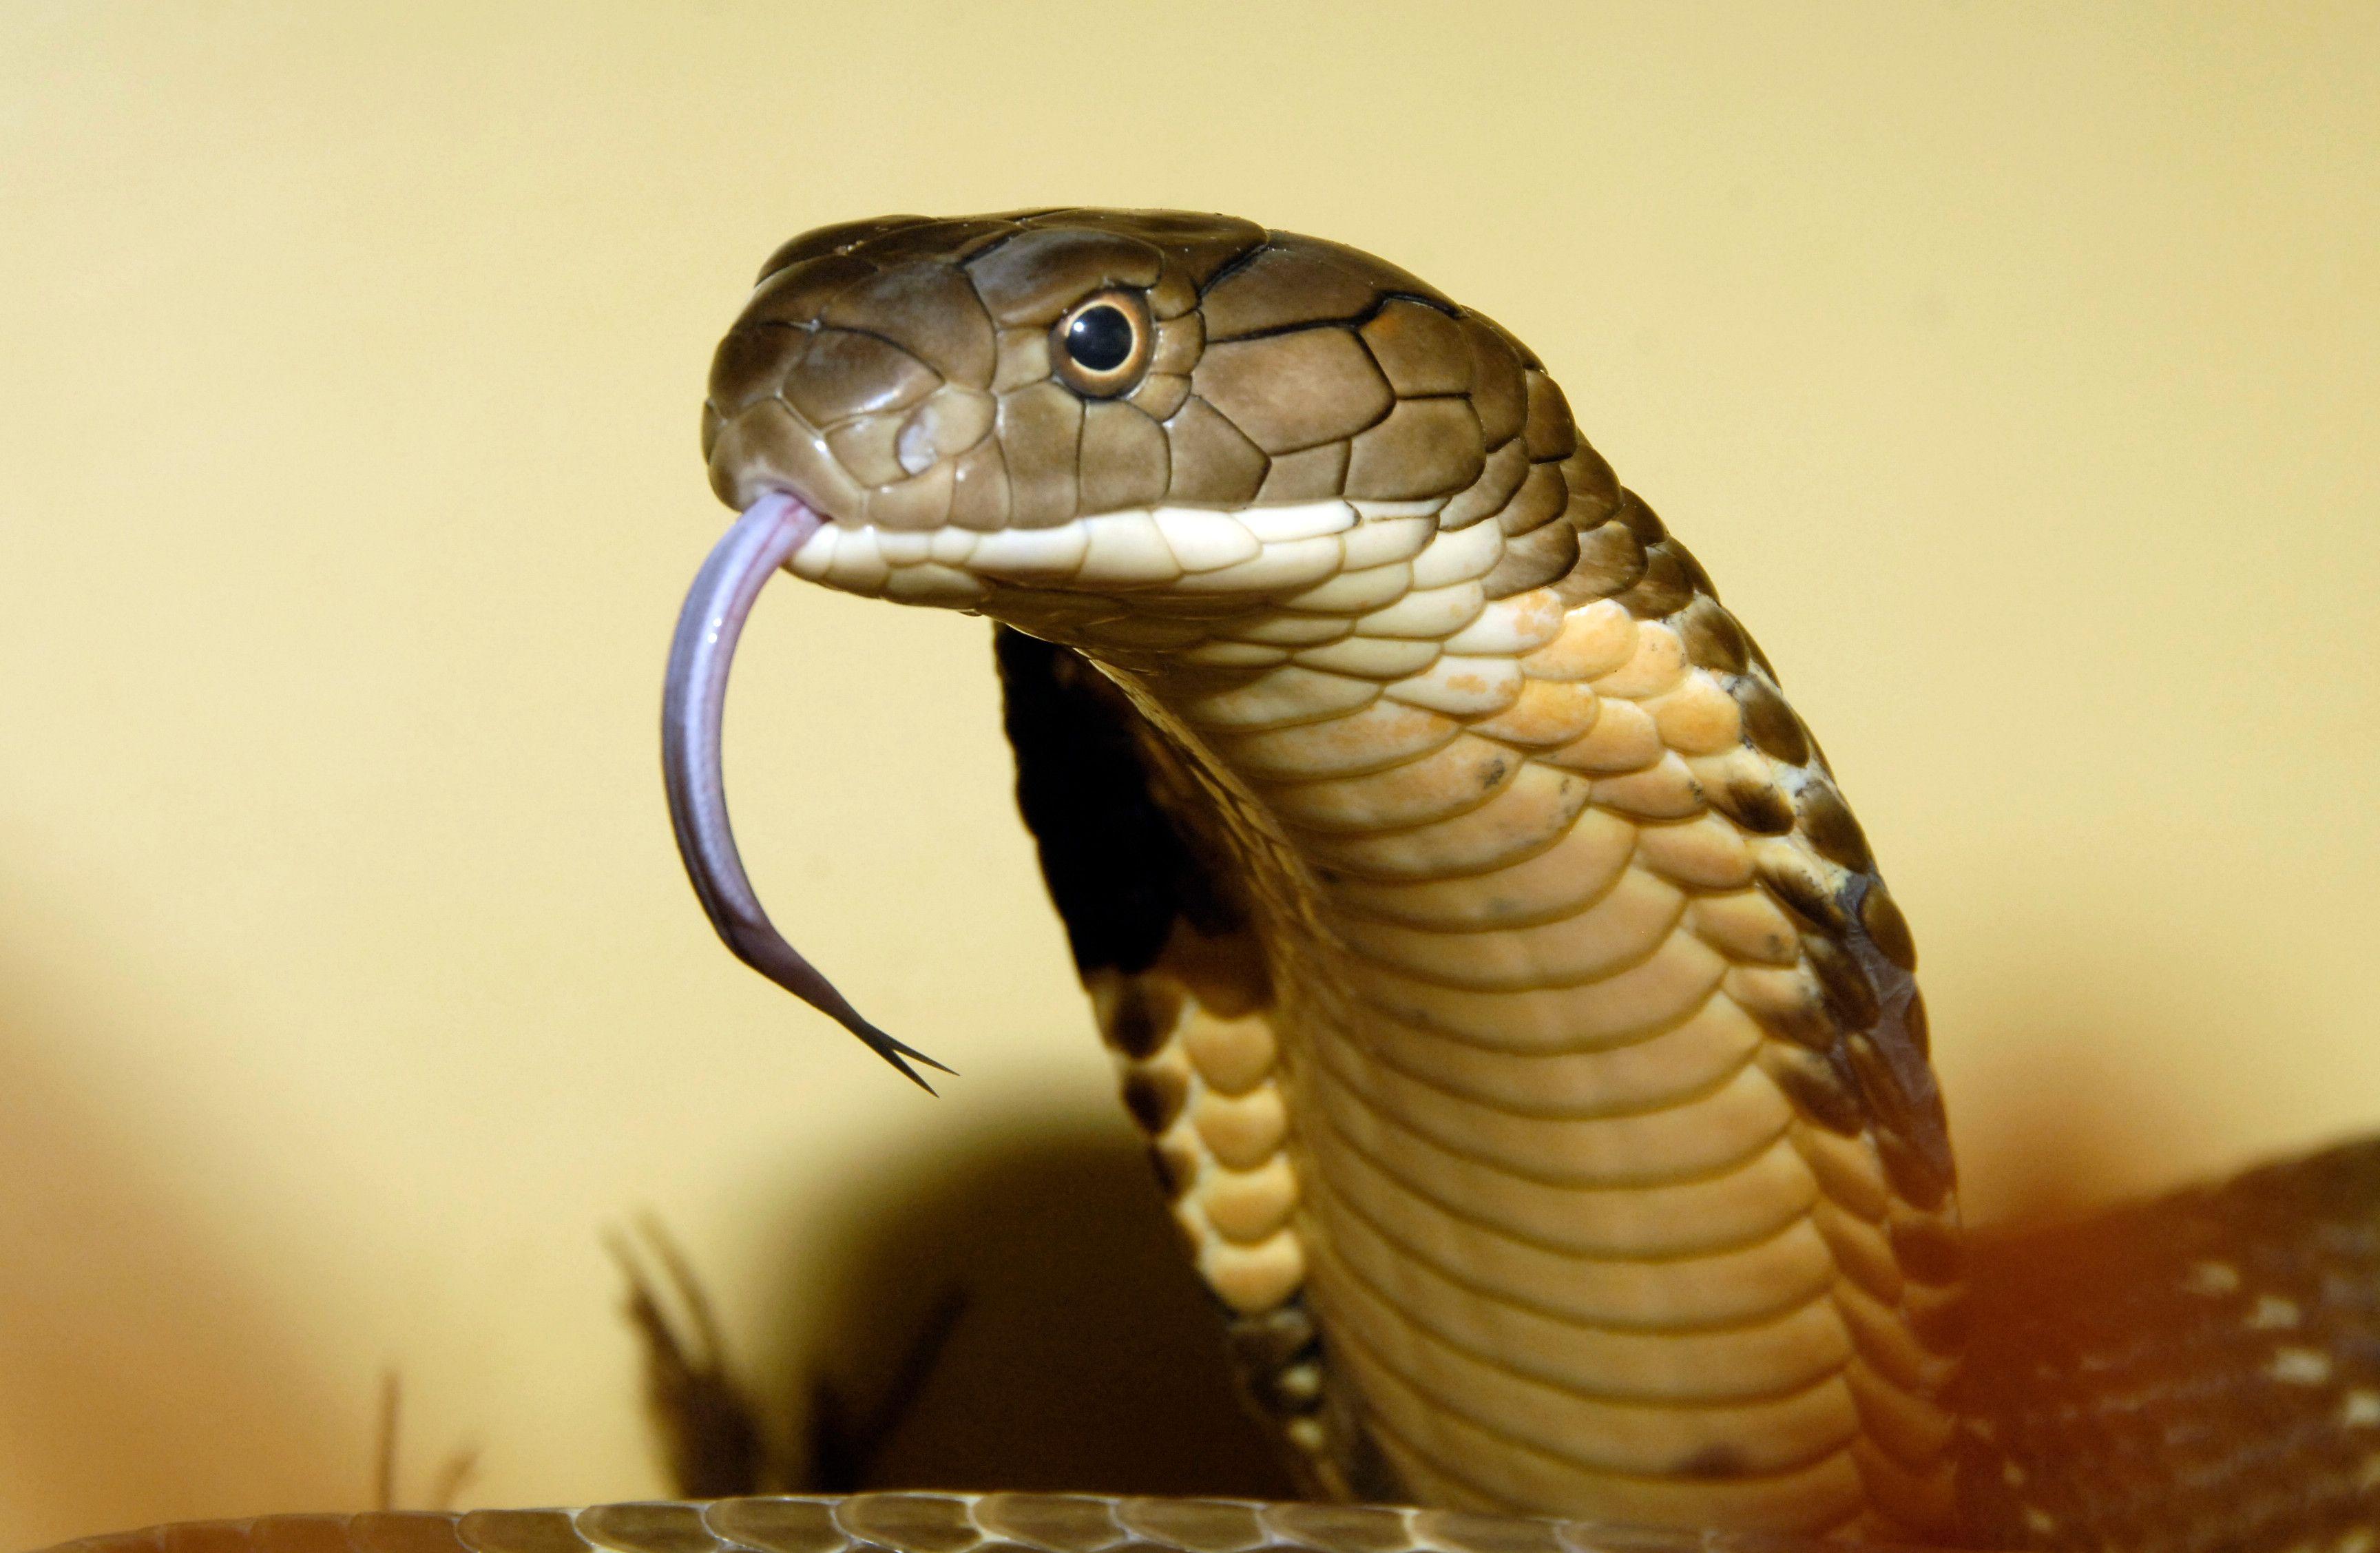 Resultado De Imagem Para National Geographic Snakes Photos Bronx Zoo Snake Water Mammals